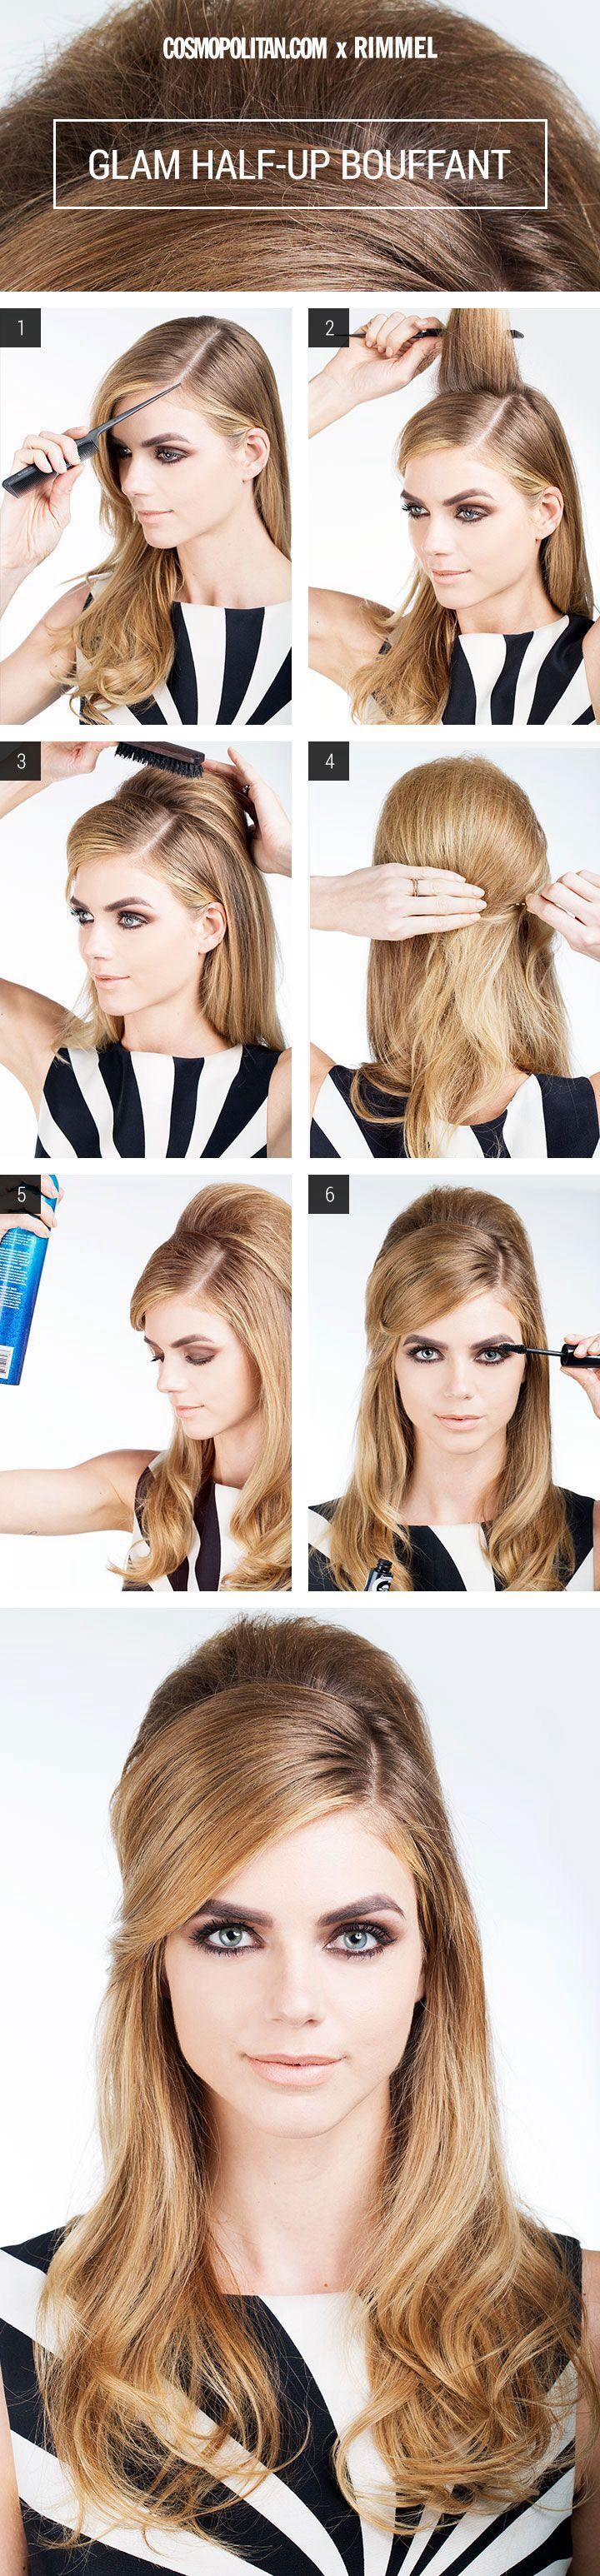 best bob hair styling images on pinterest